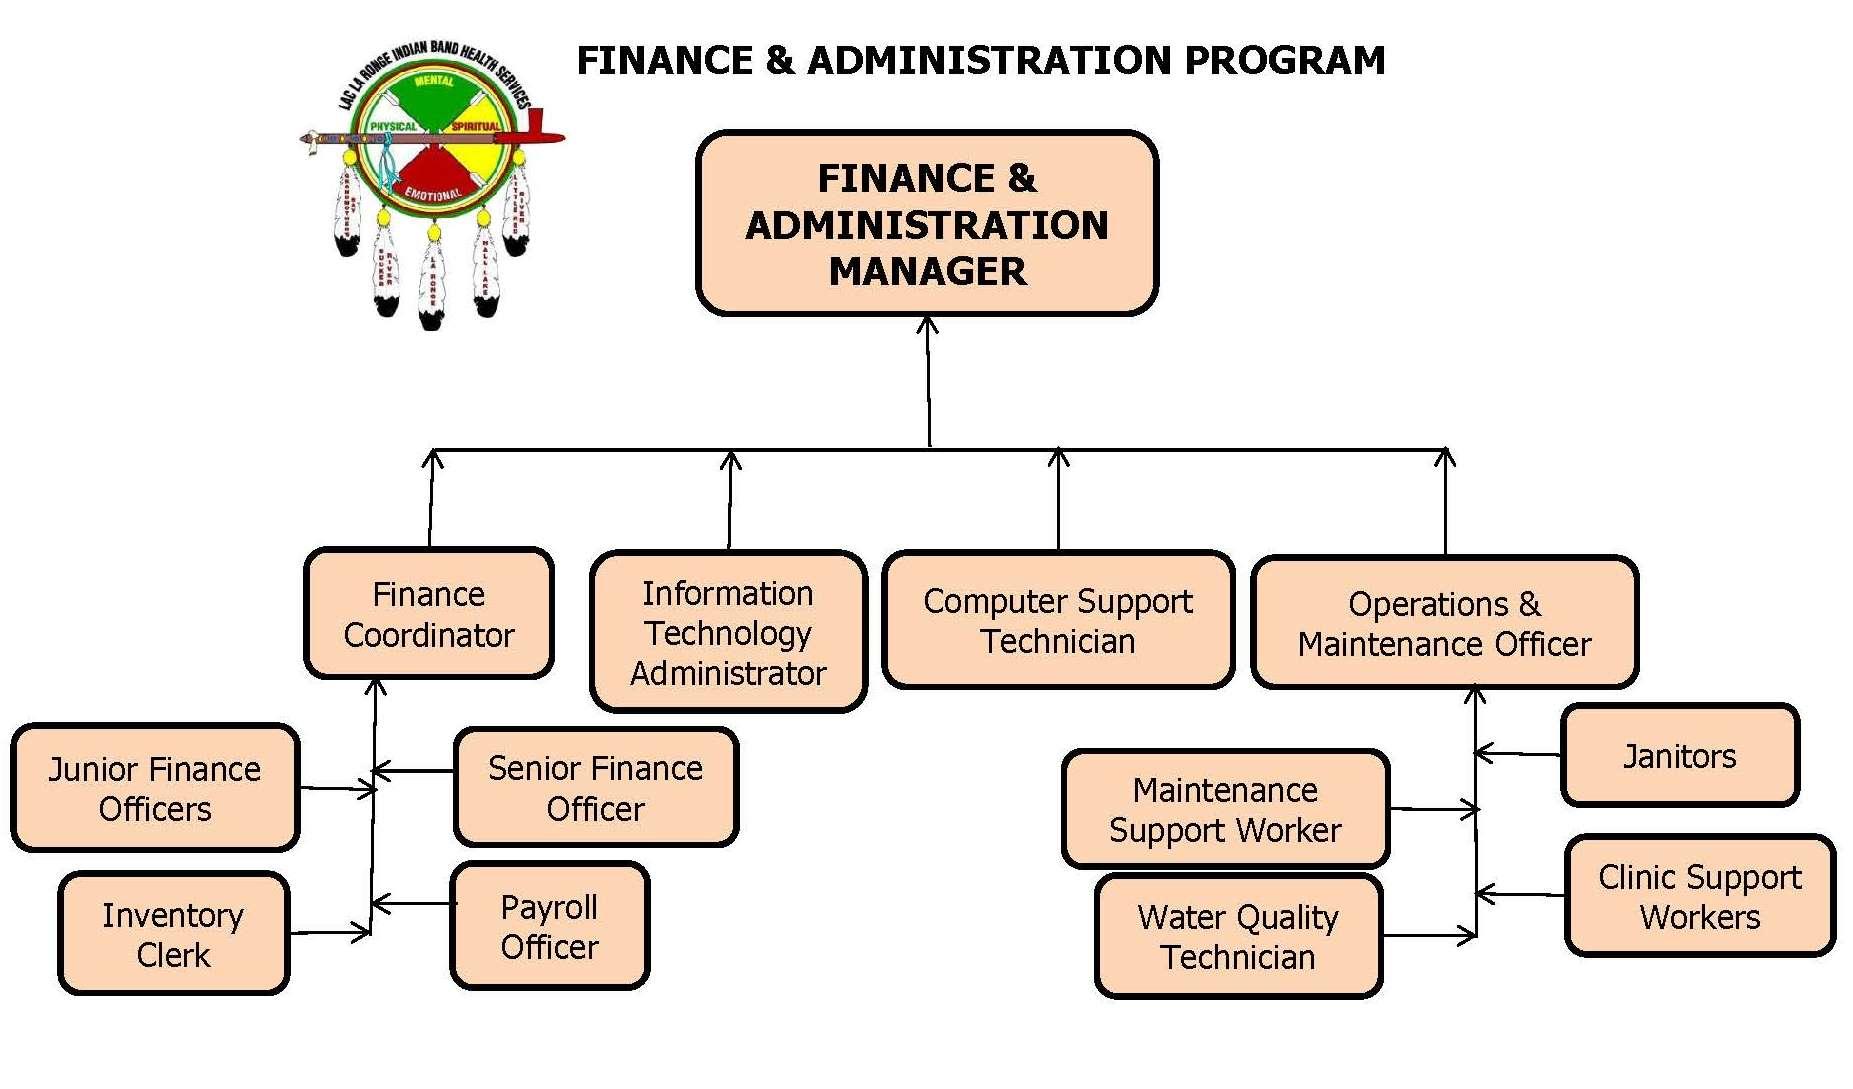 Finance & Administration Program Org Chart